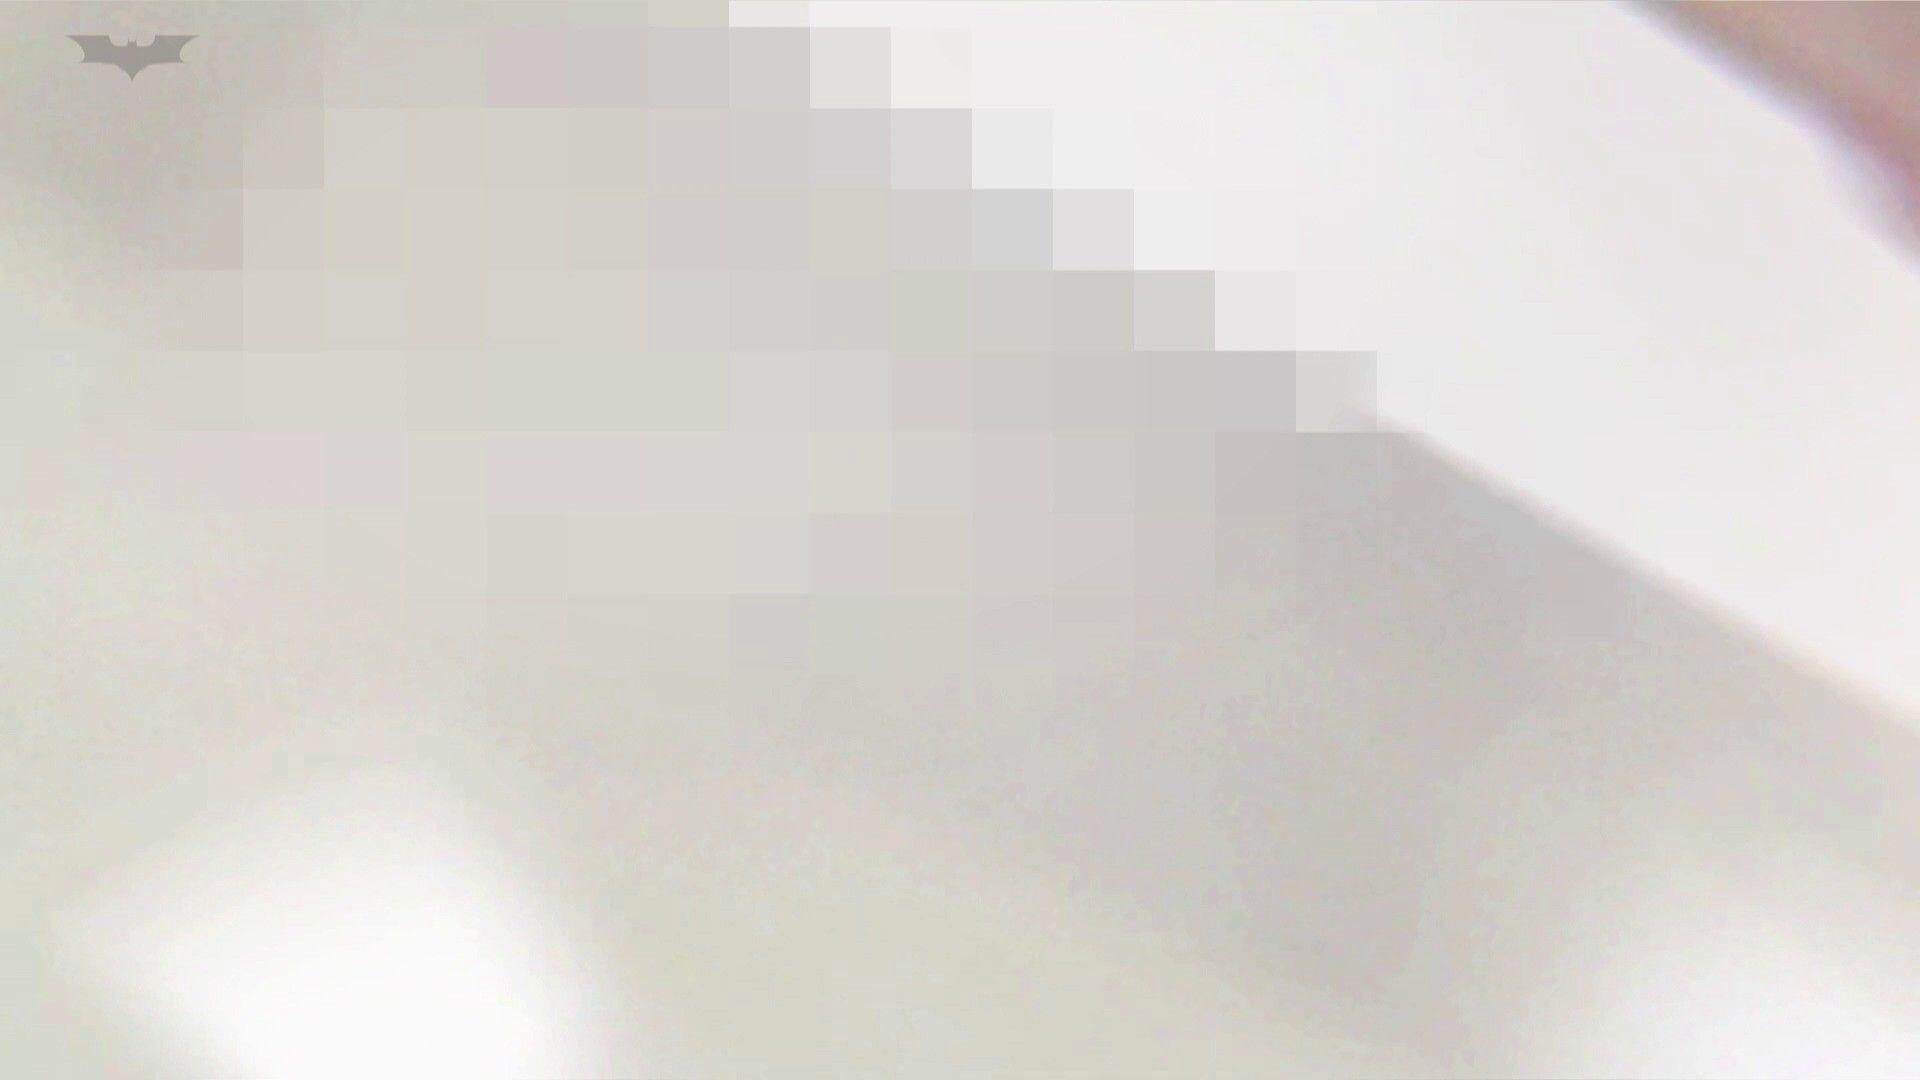 ▲復活限定D▲第三体育館潜入撮File018 夏帆に激似現役の未開発の下を 体育館 濡れ場動画紹介 19連発 5